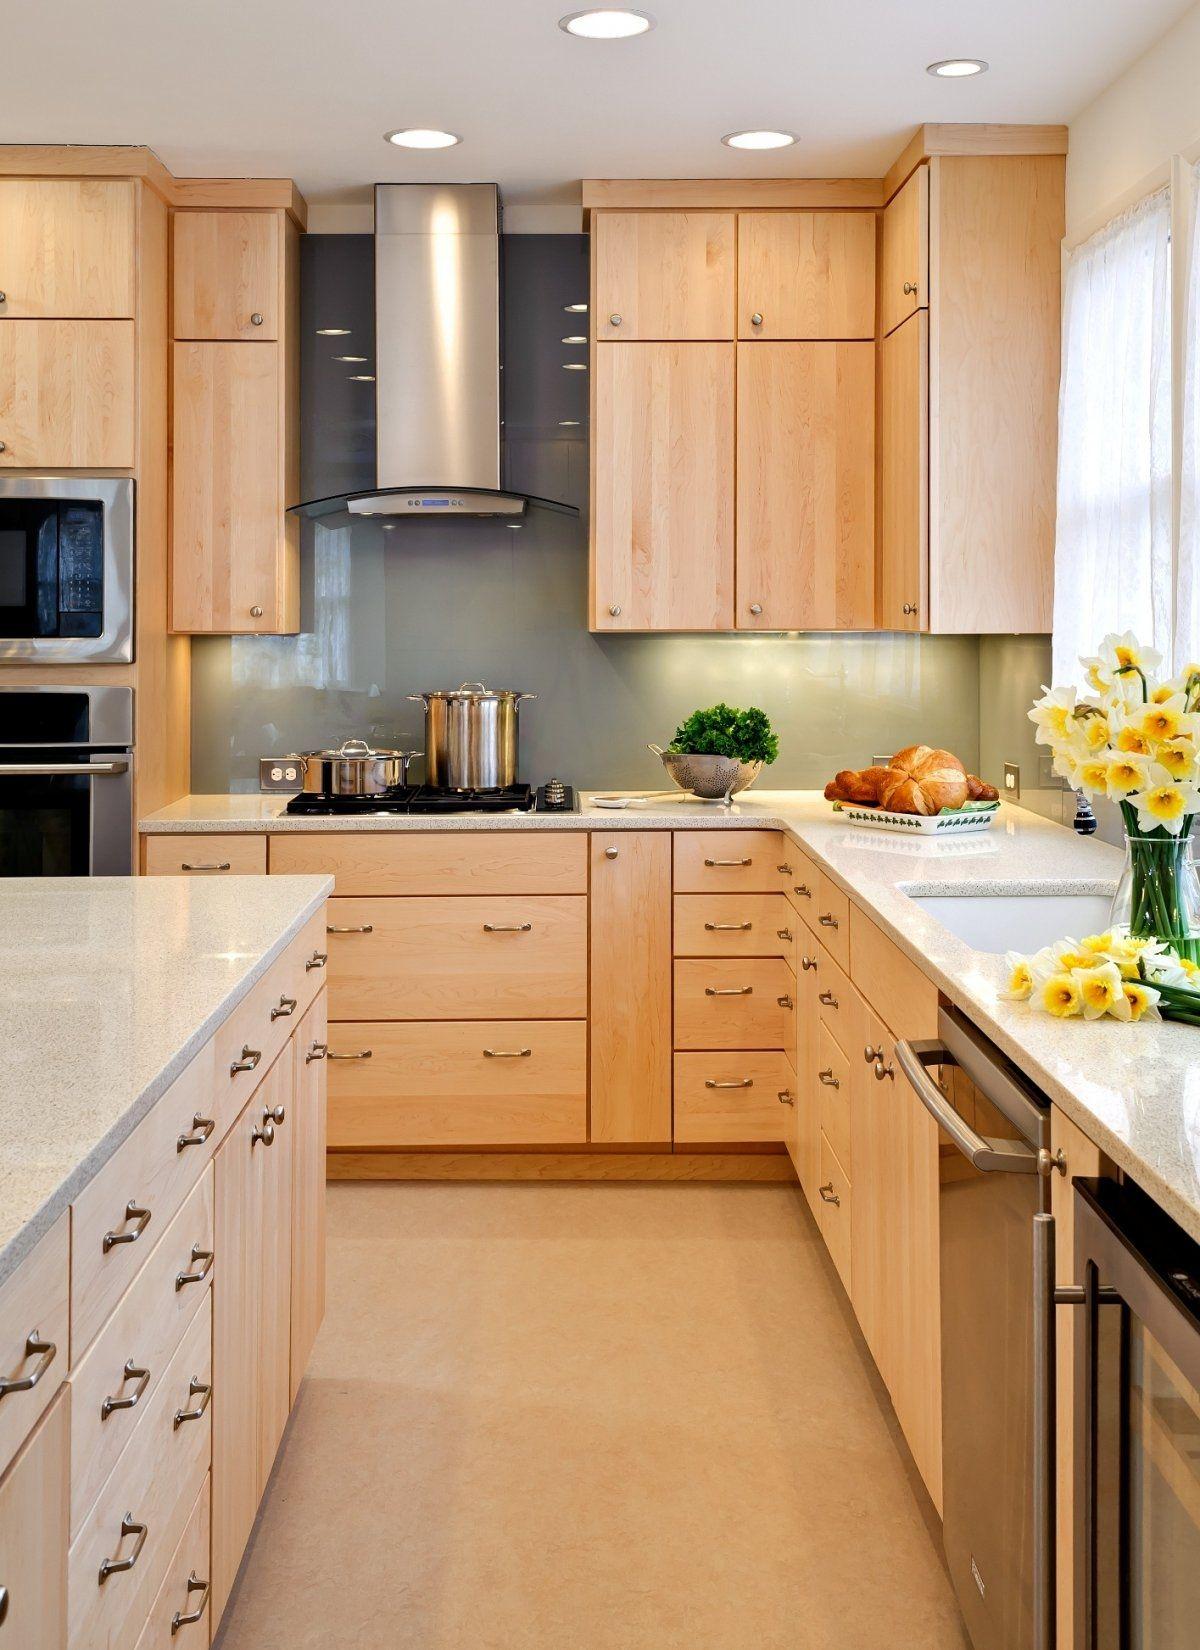 Beige Kitchen Cabinets Wall Color   Birch kitchen cabinets ...